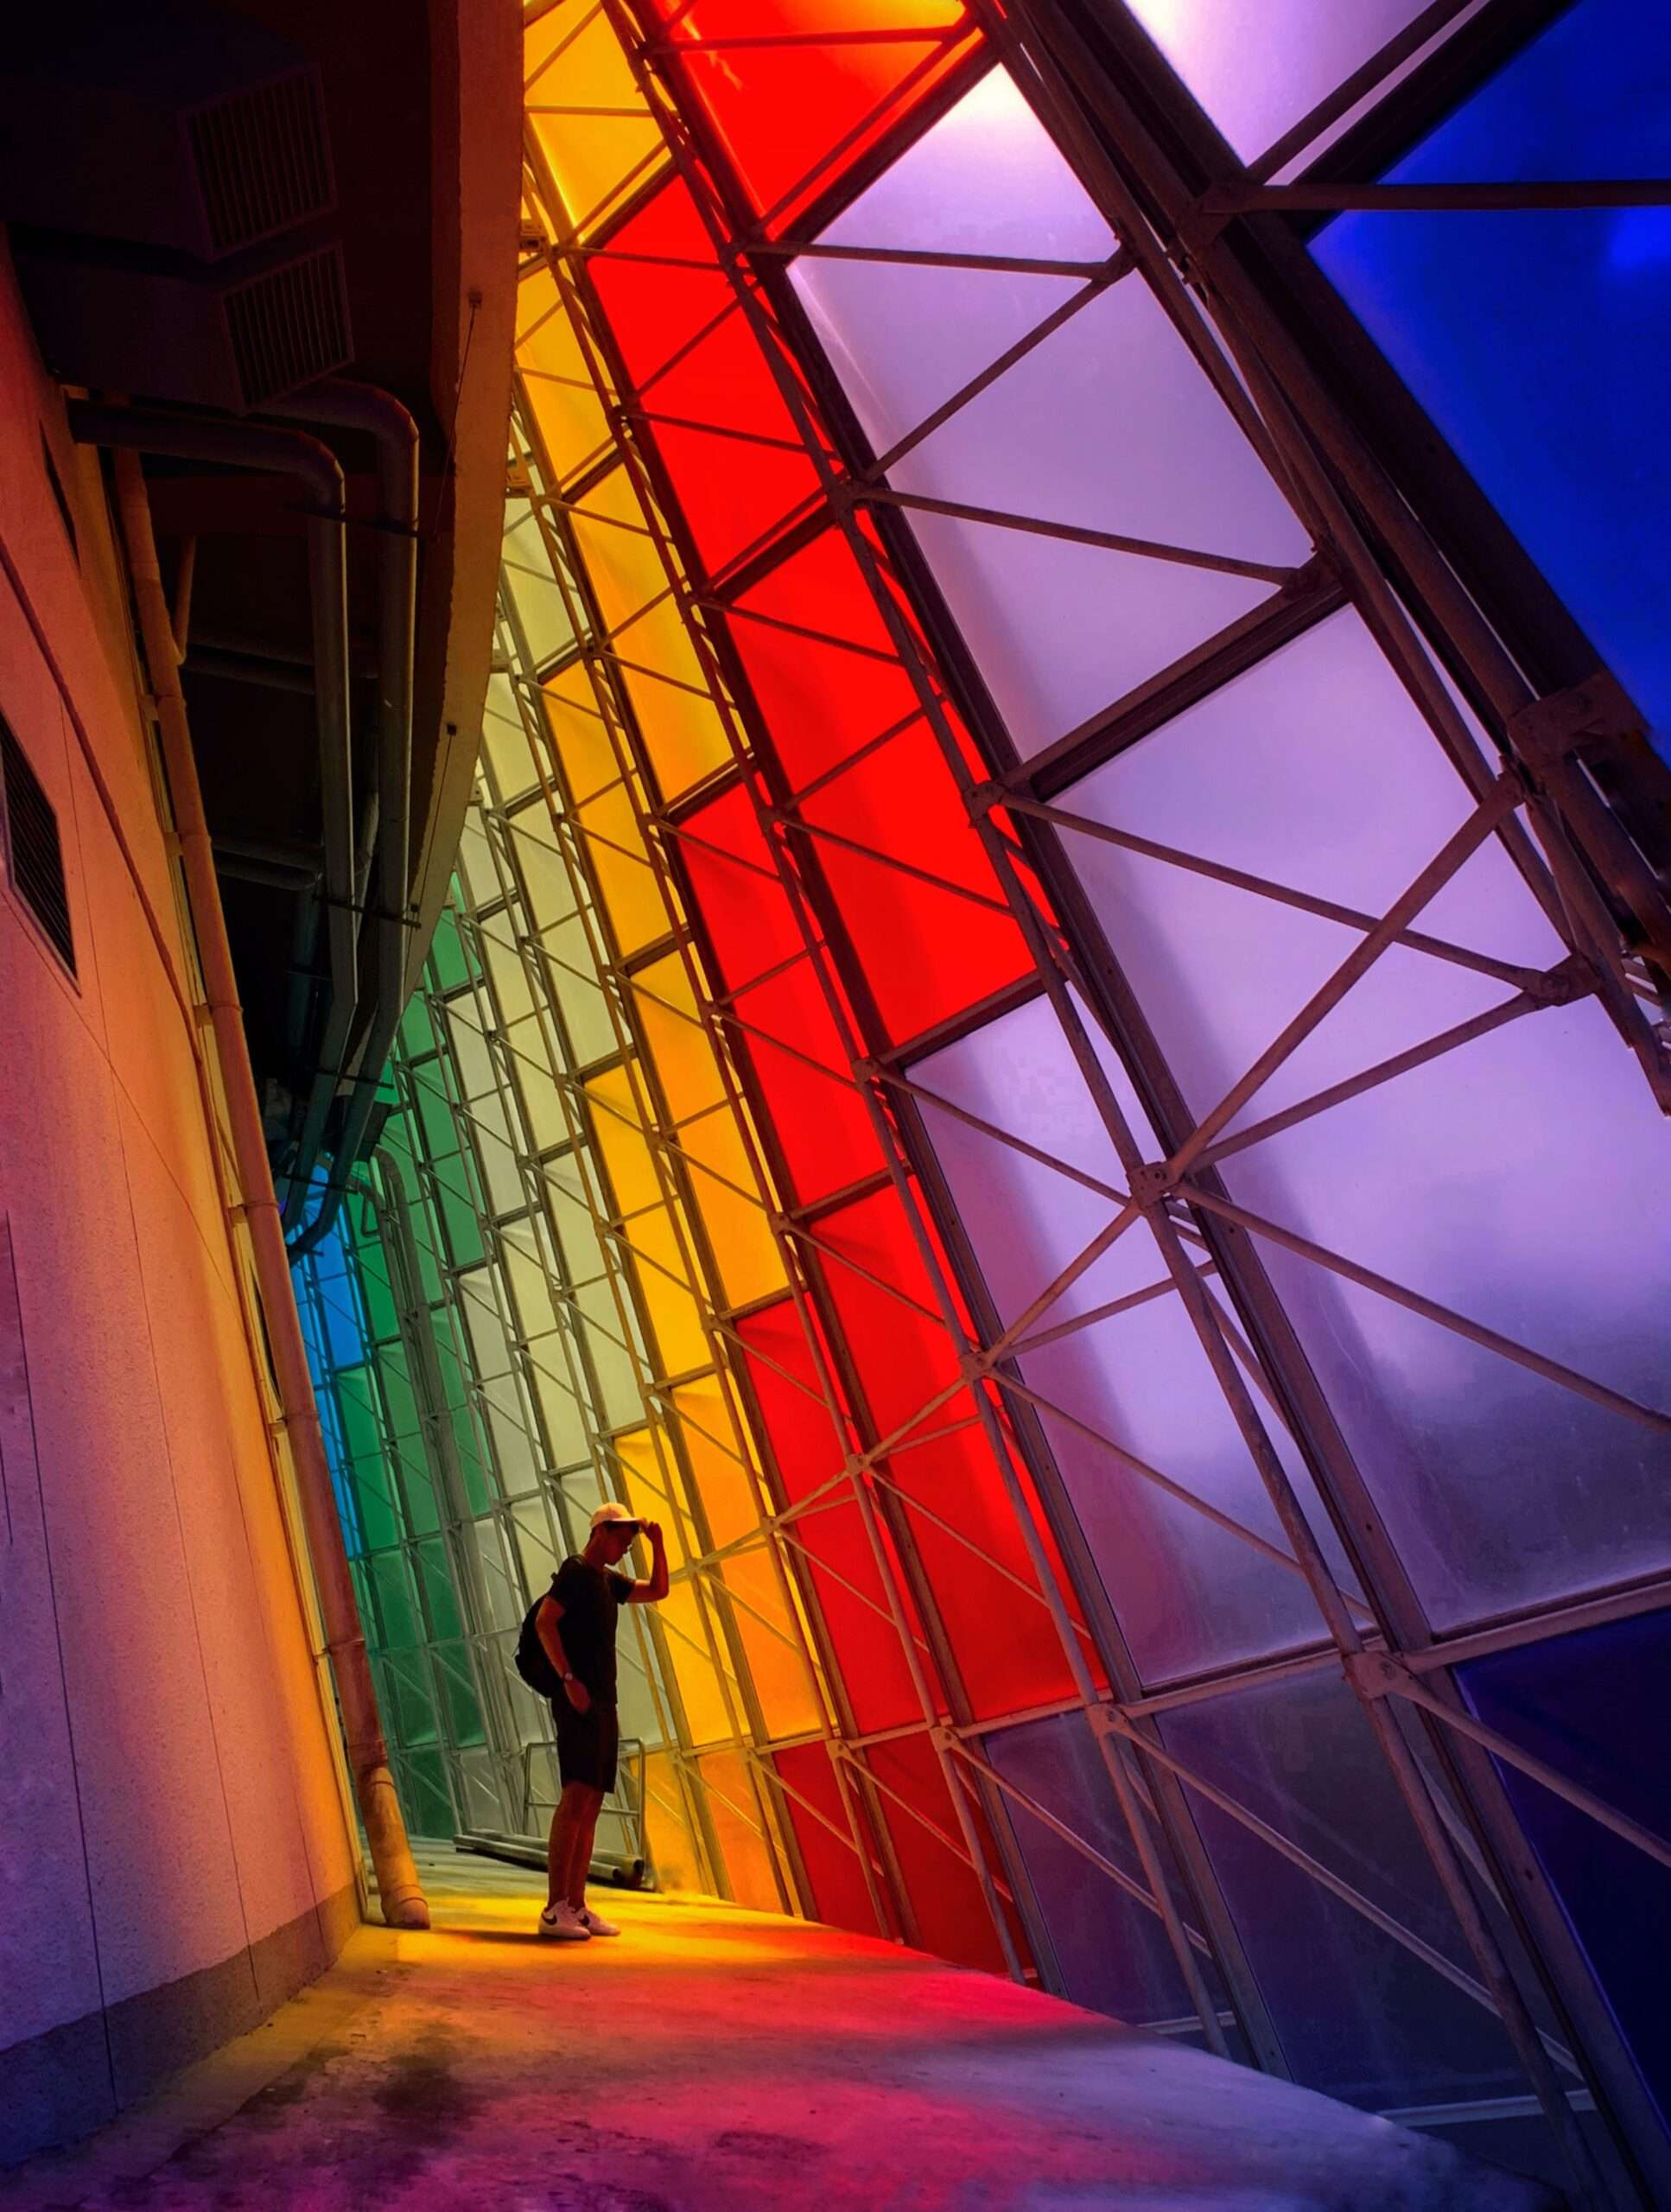 rainbow stained glass windows in Kuala Lumpur